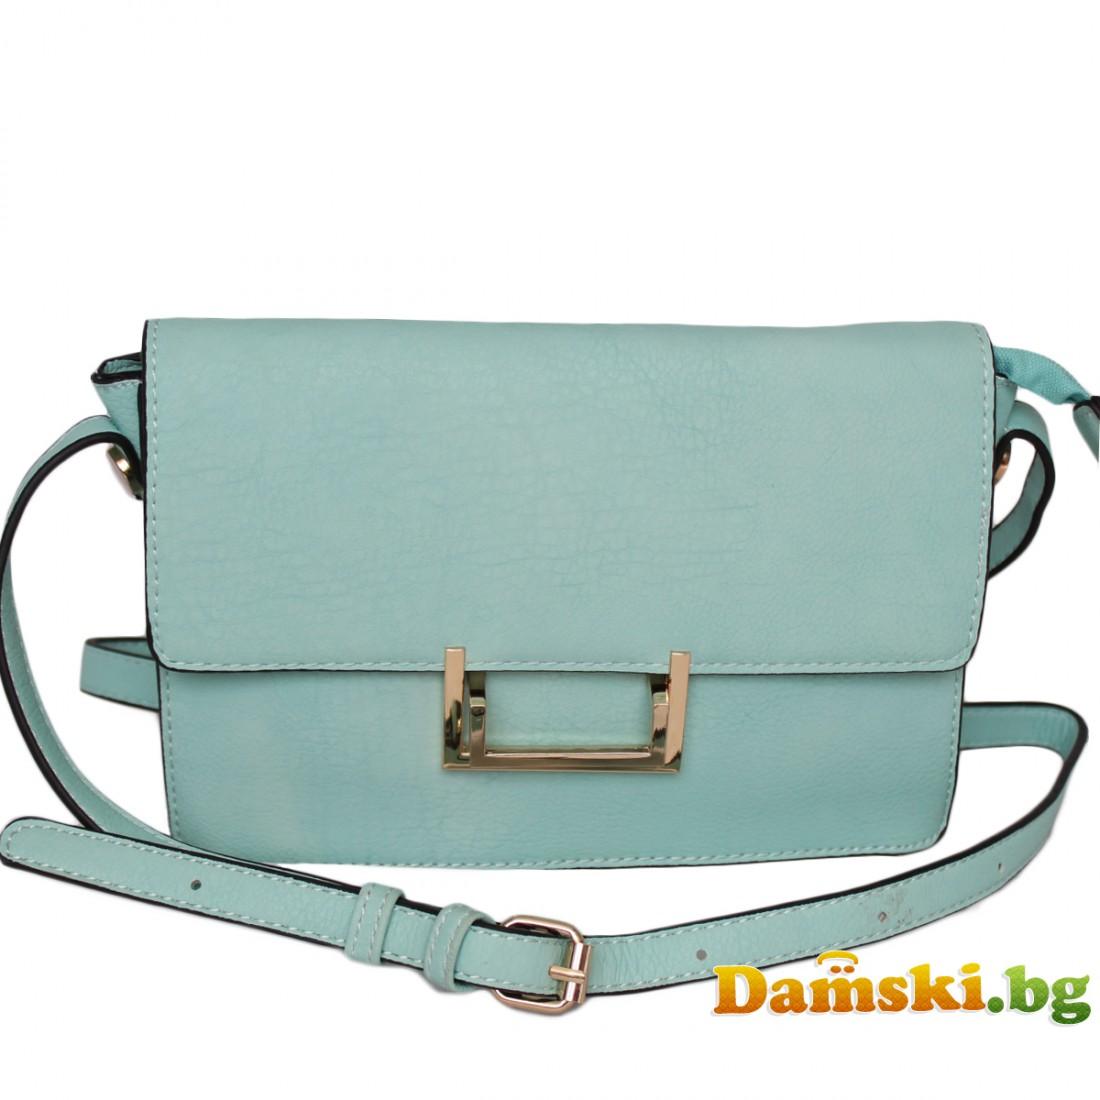 Дамска чанта през рамо - Мента